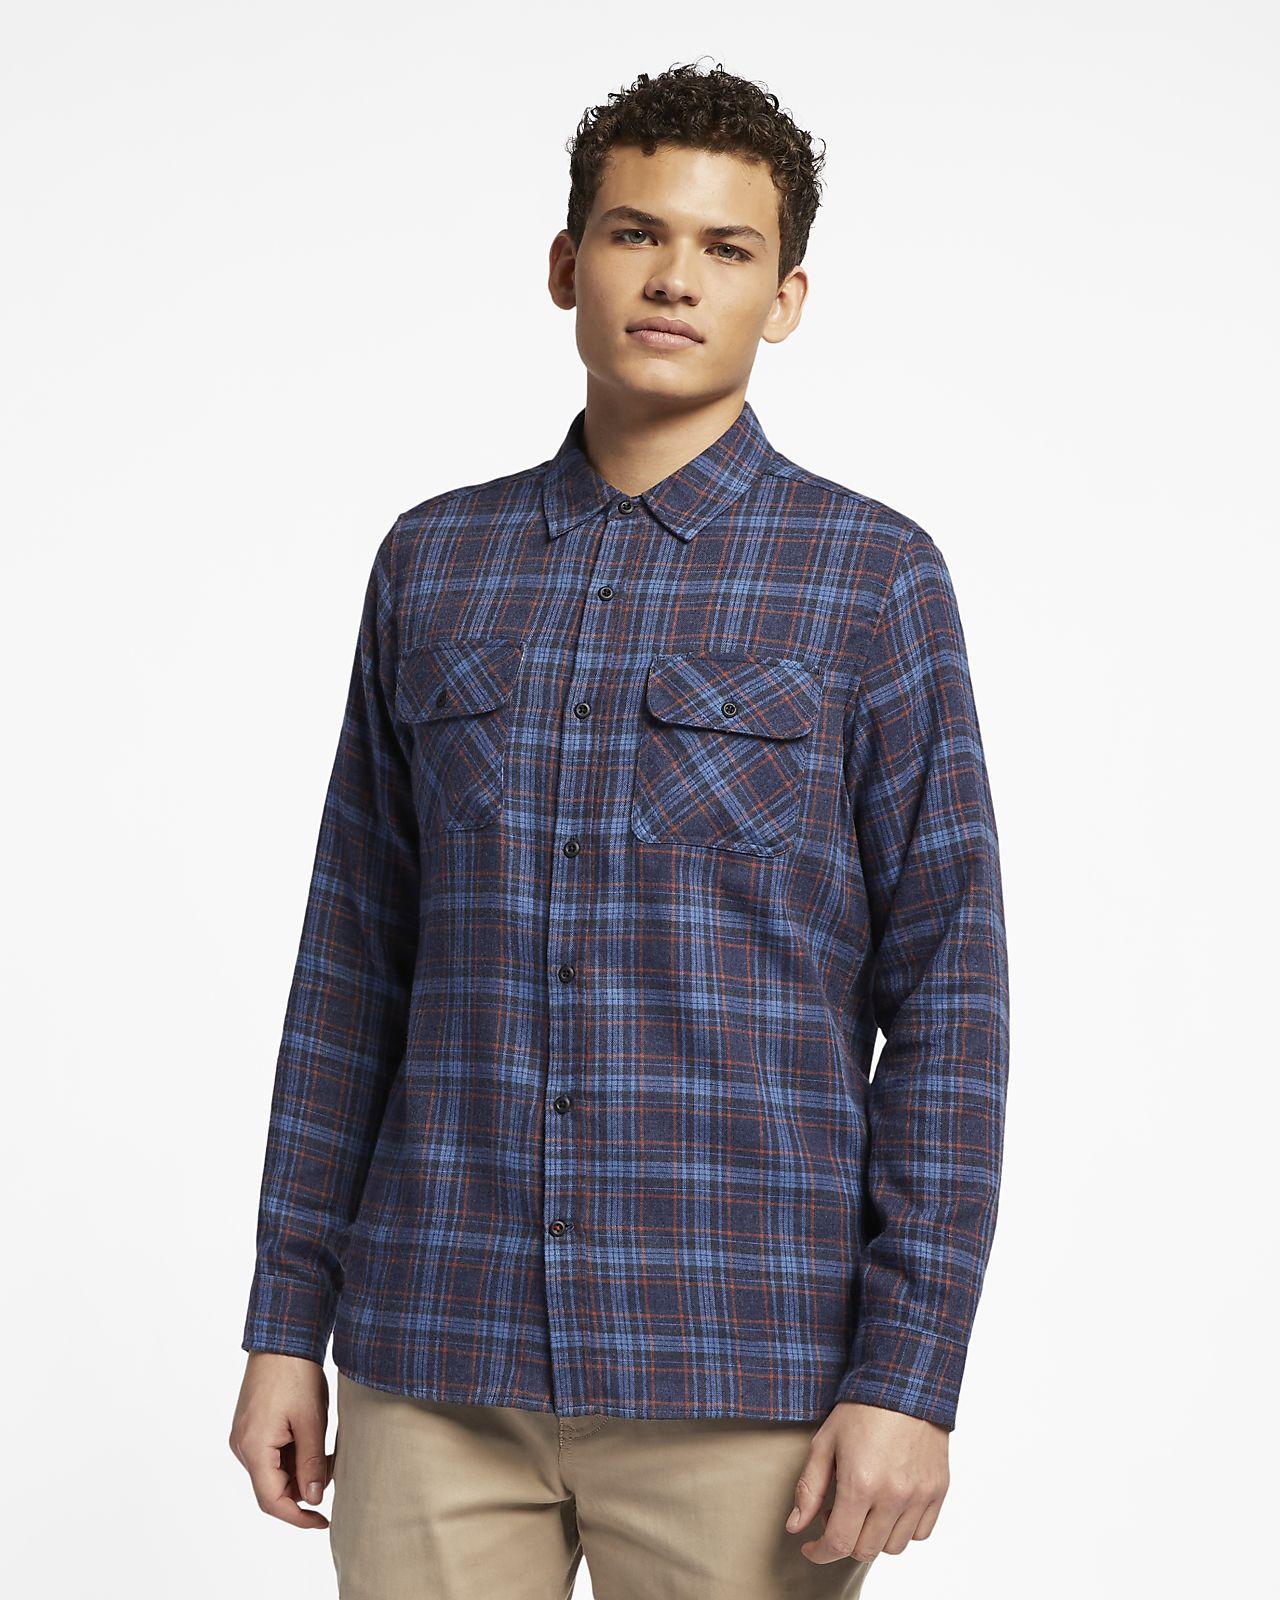 Camisa de flanela de manga comprida Hurley Walker para homem